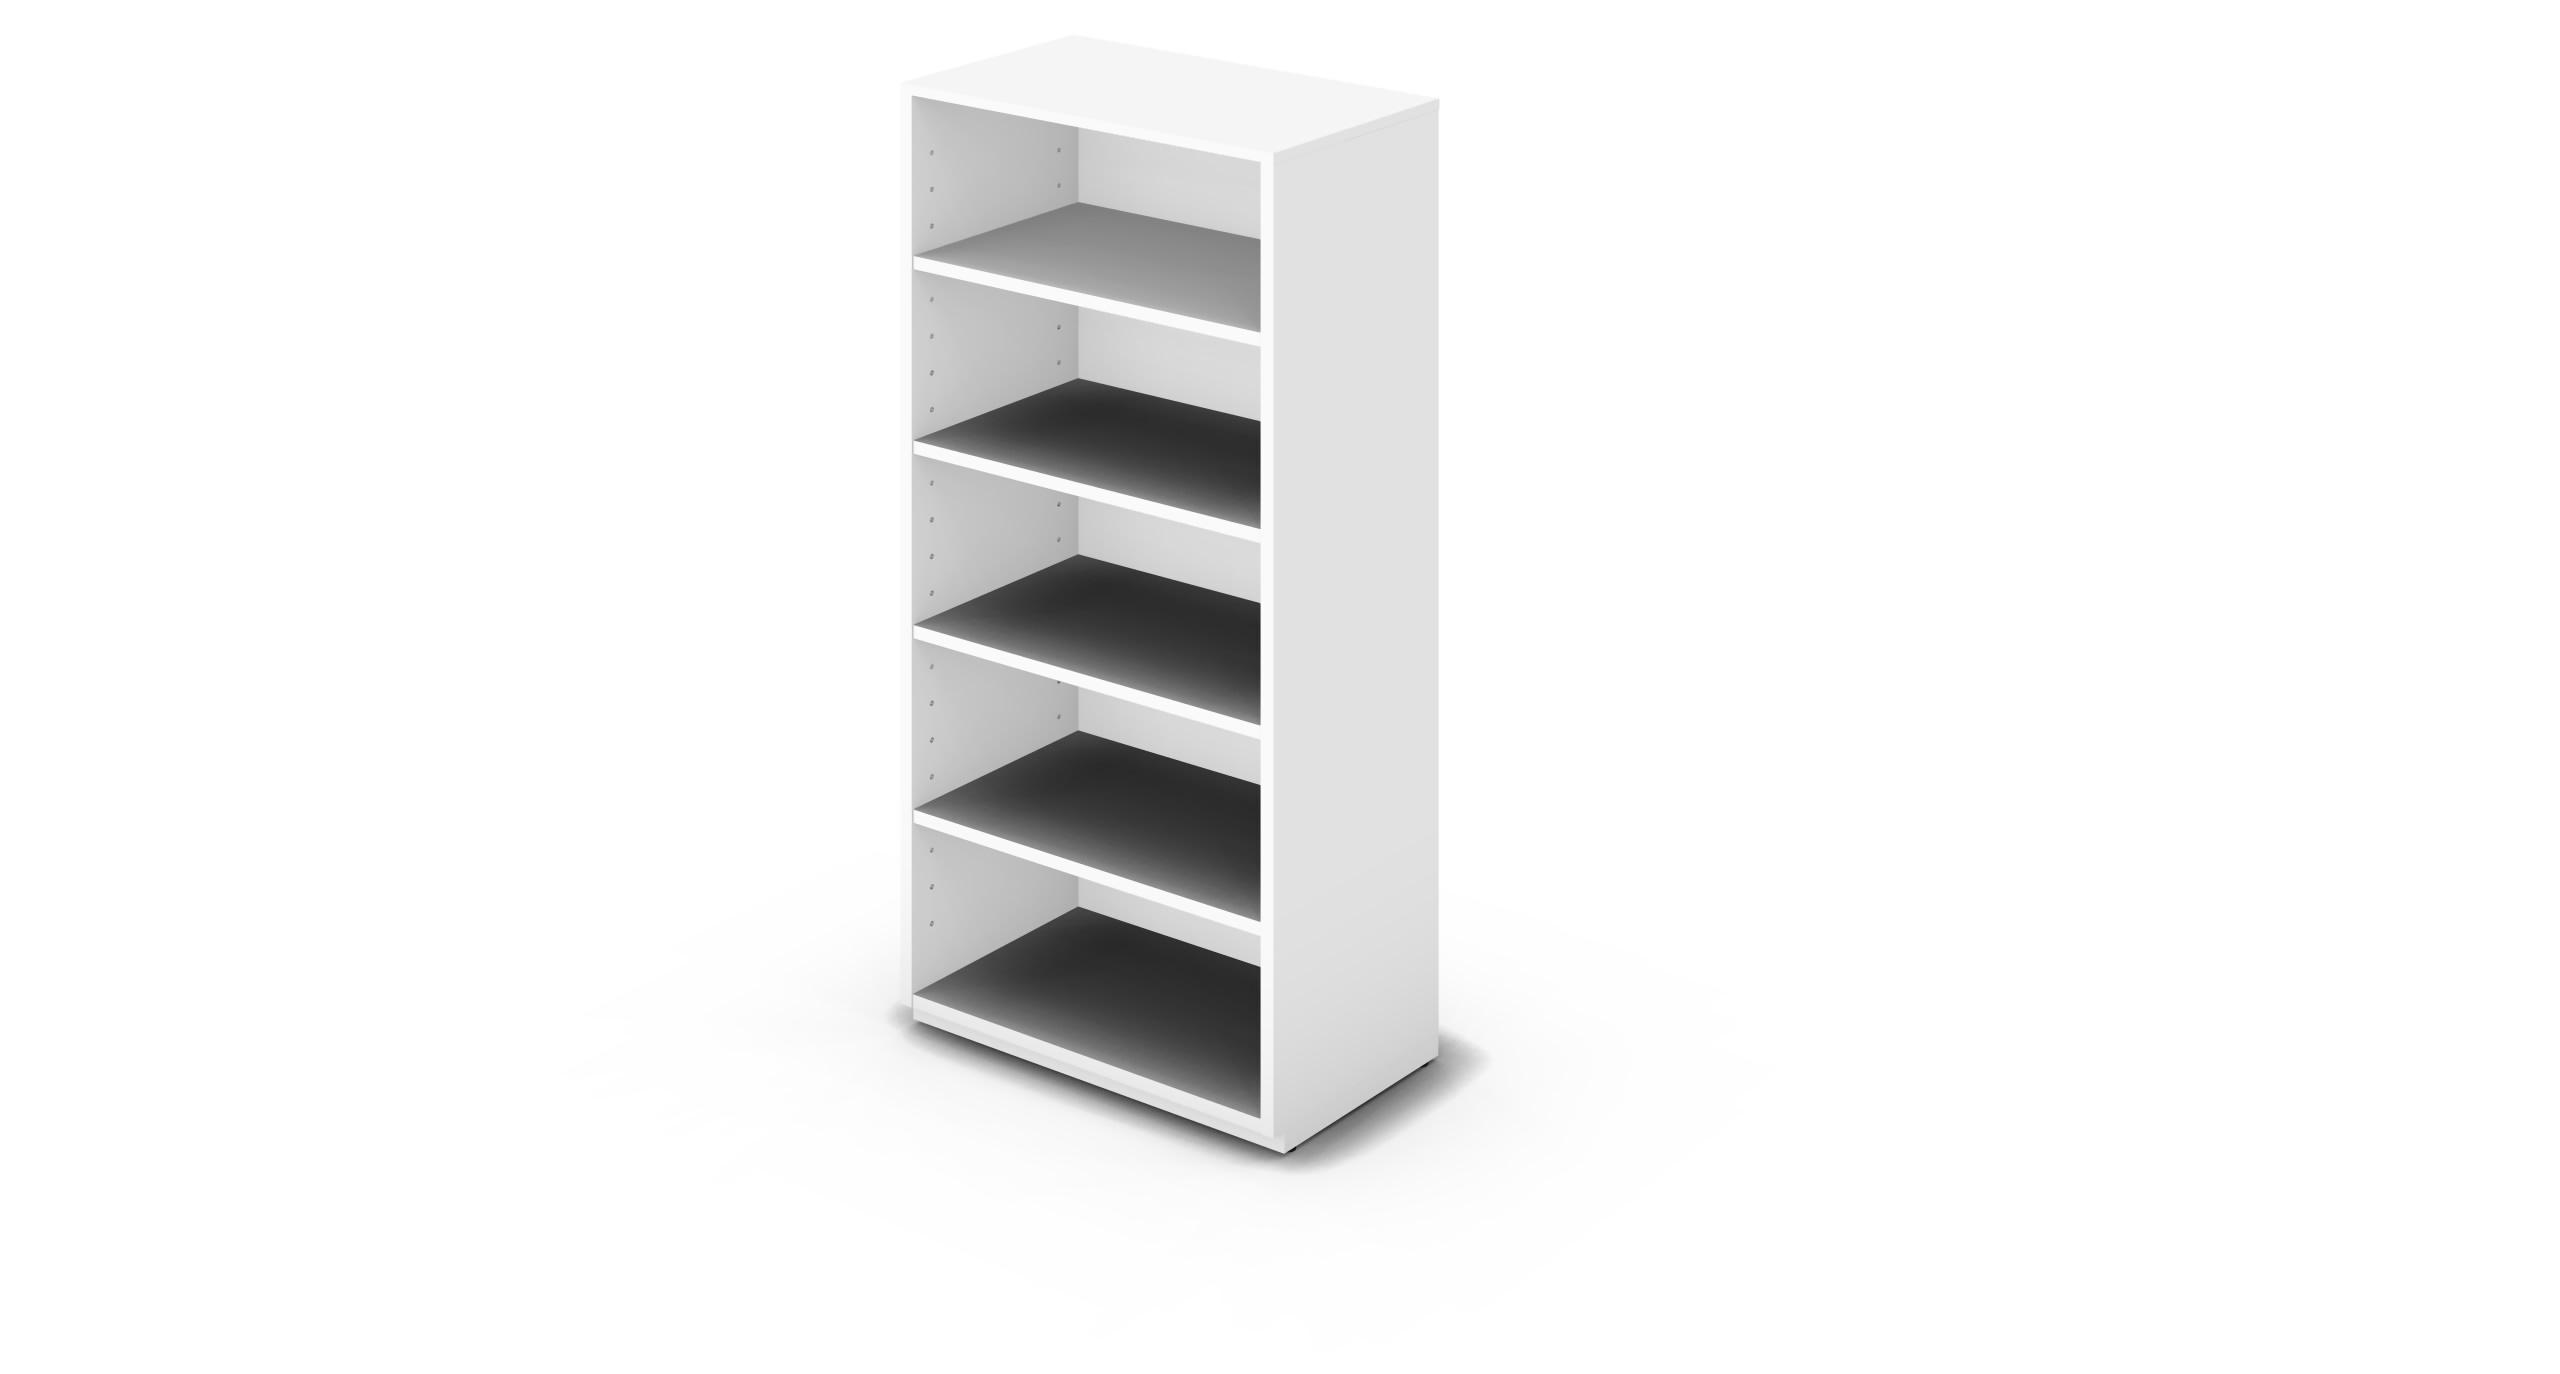 Shelf_800x450x1800_White